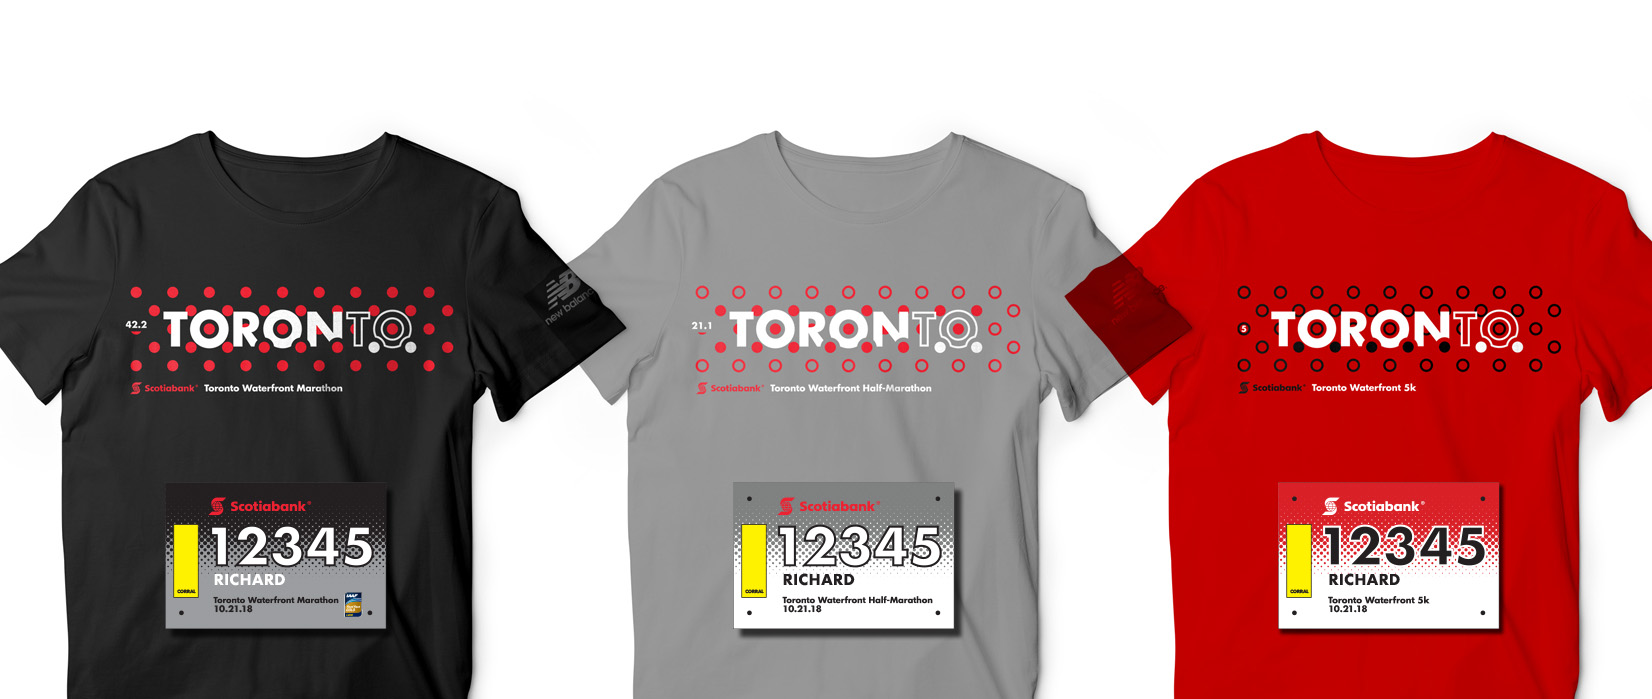 Marathon, Half Marathon and 5k Scotiabank Toronto Waterfront Marathon race shirts and bibs